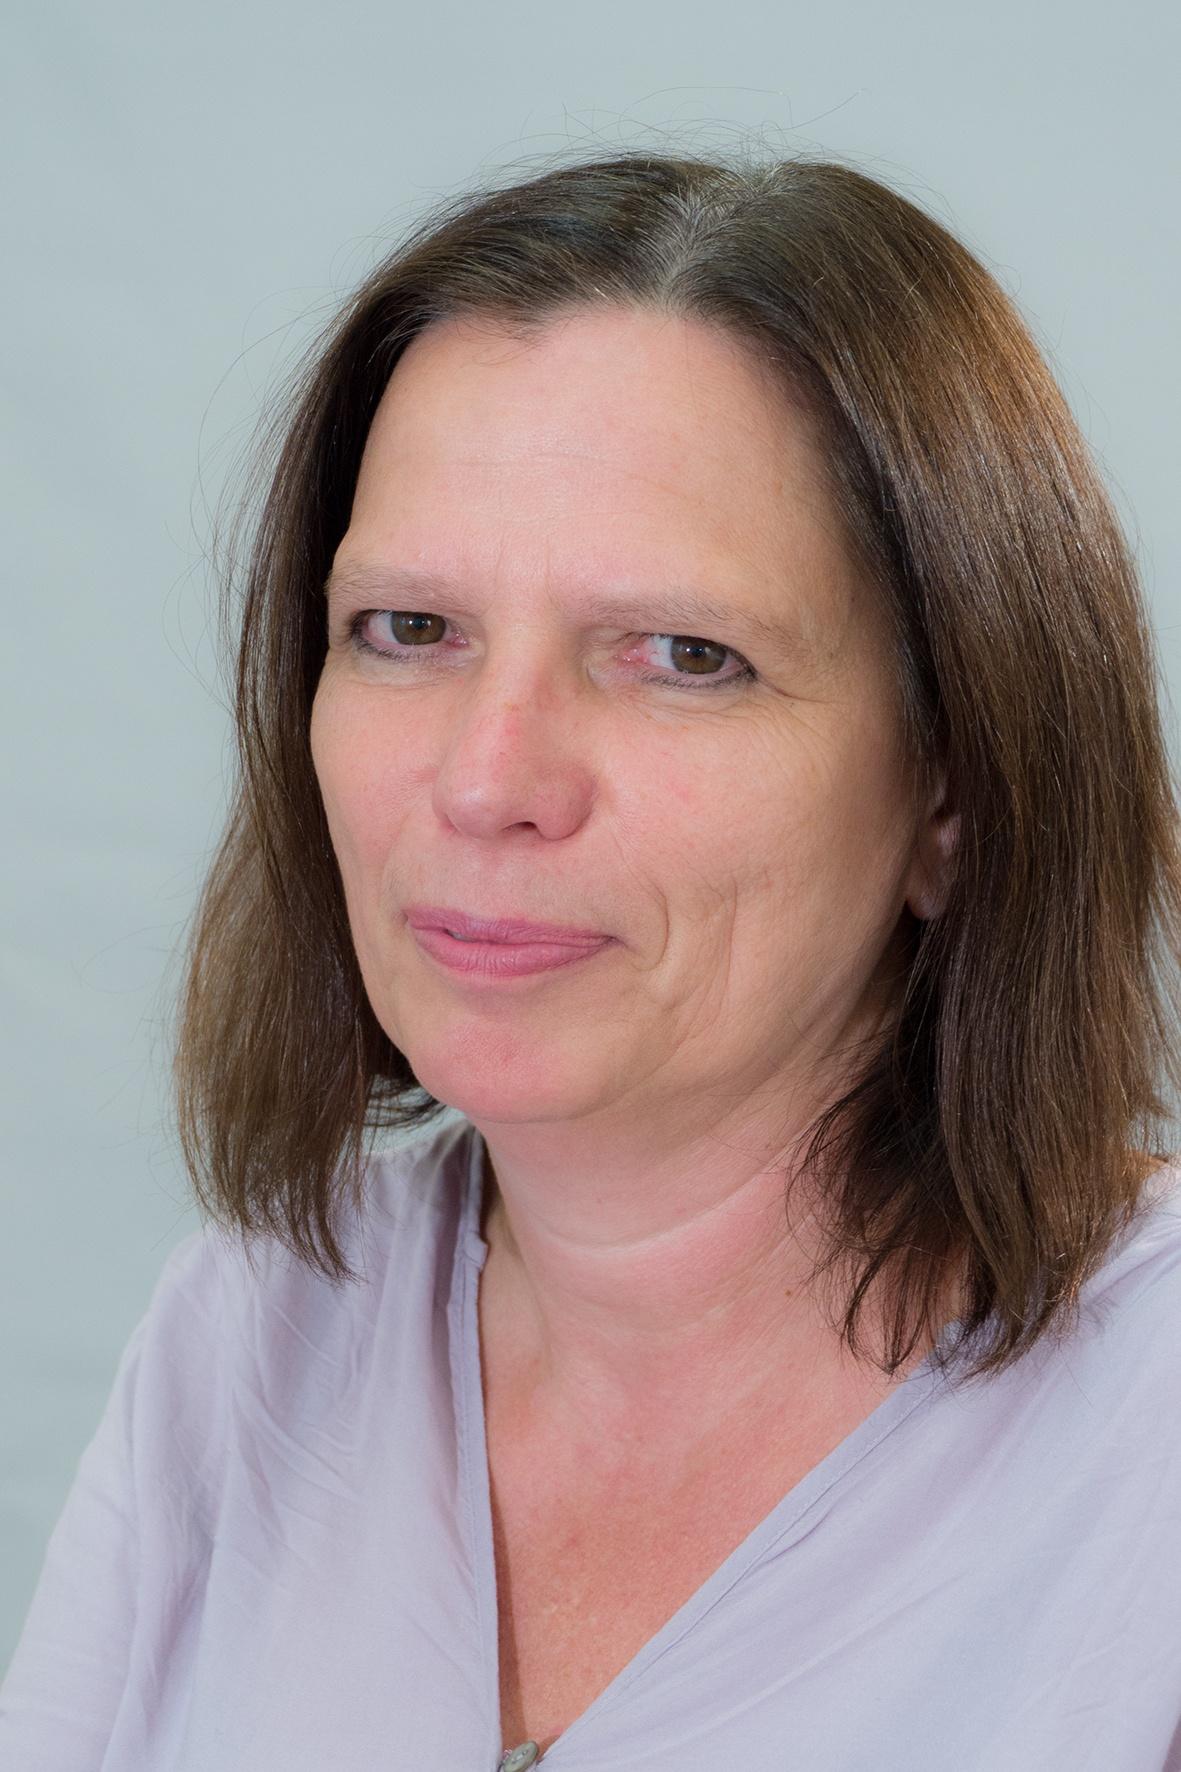 Mechthild Meiers